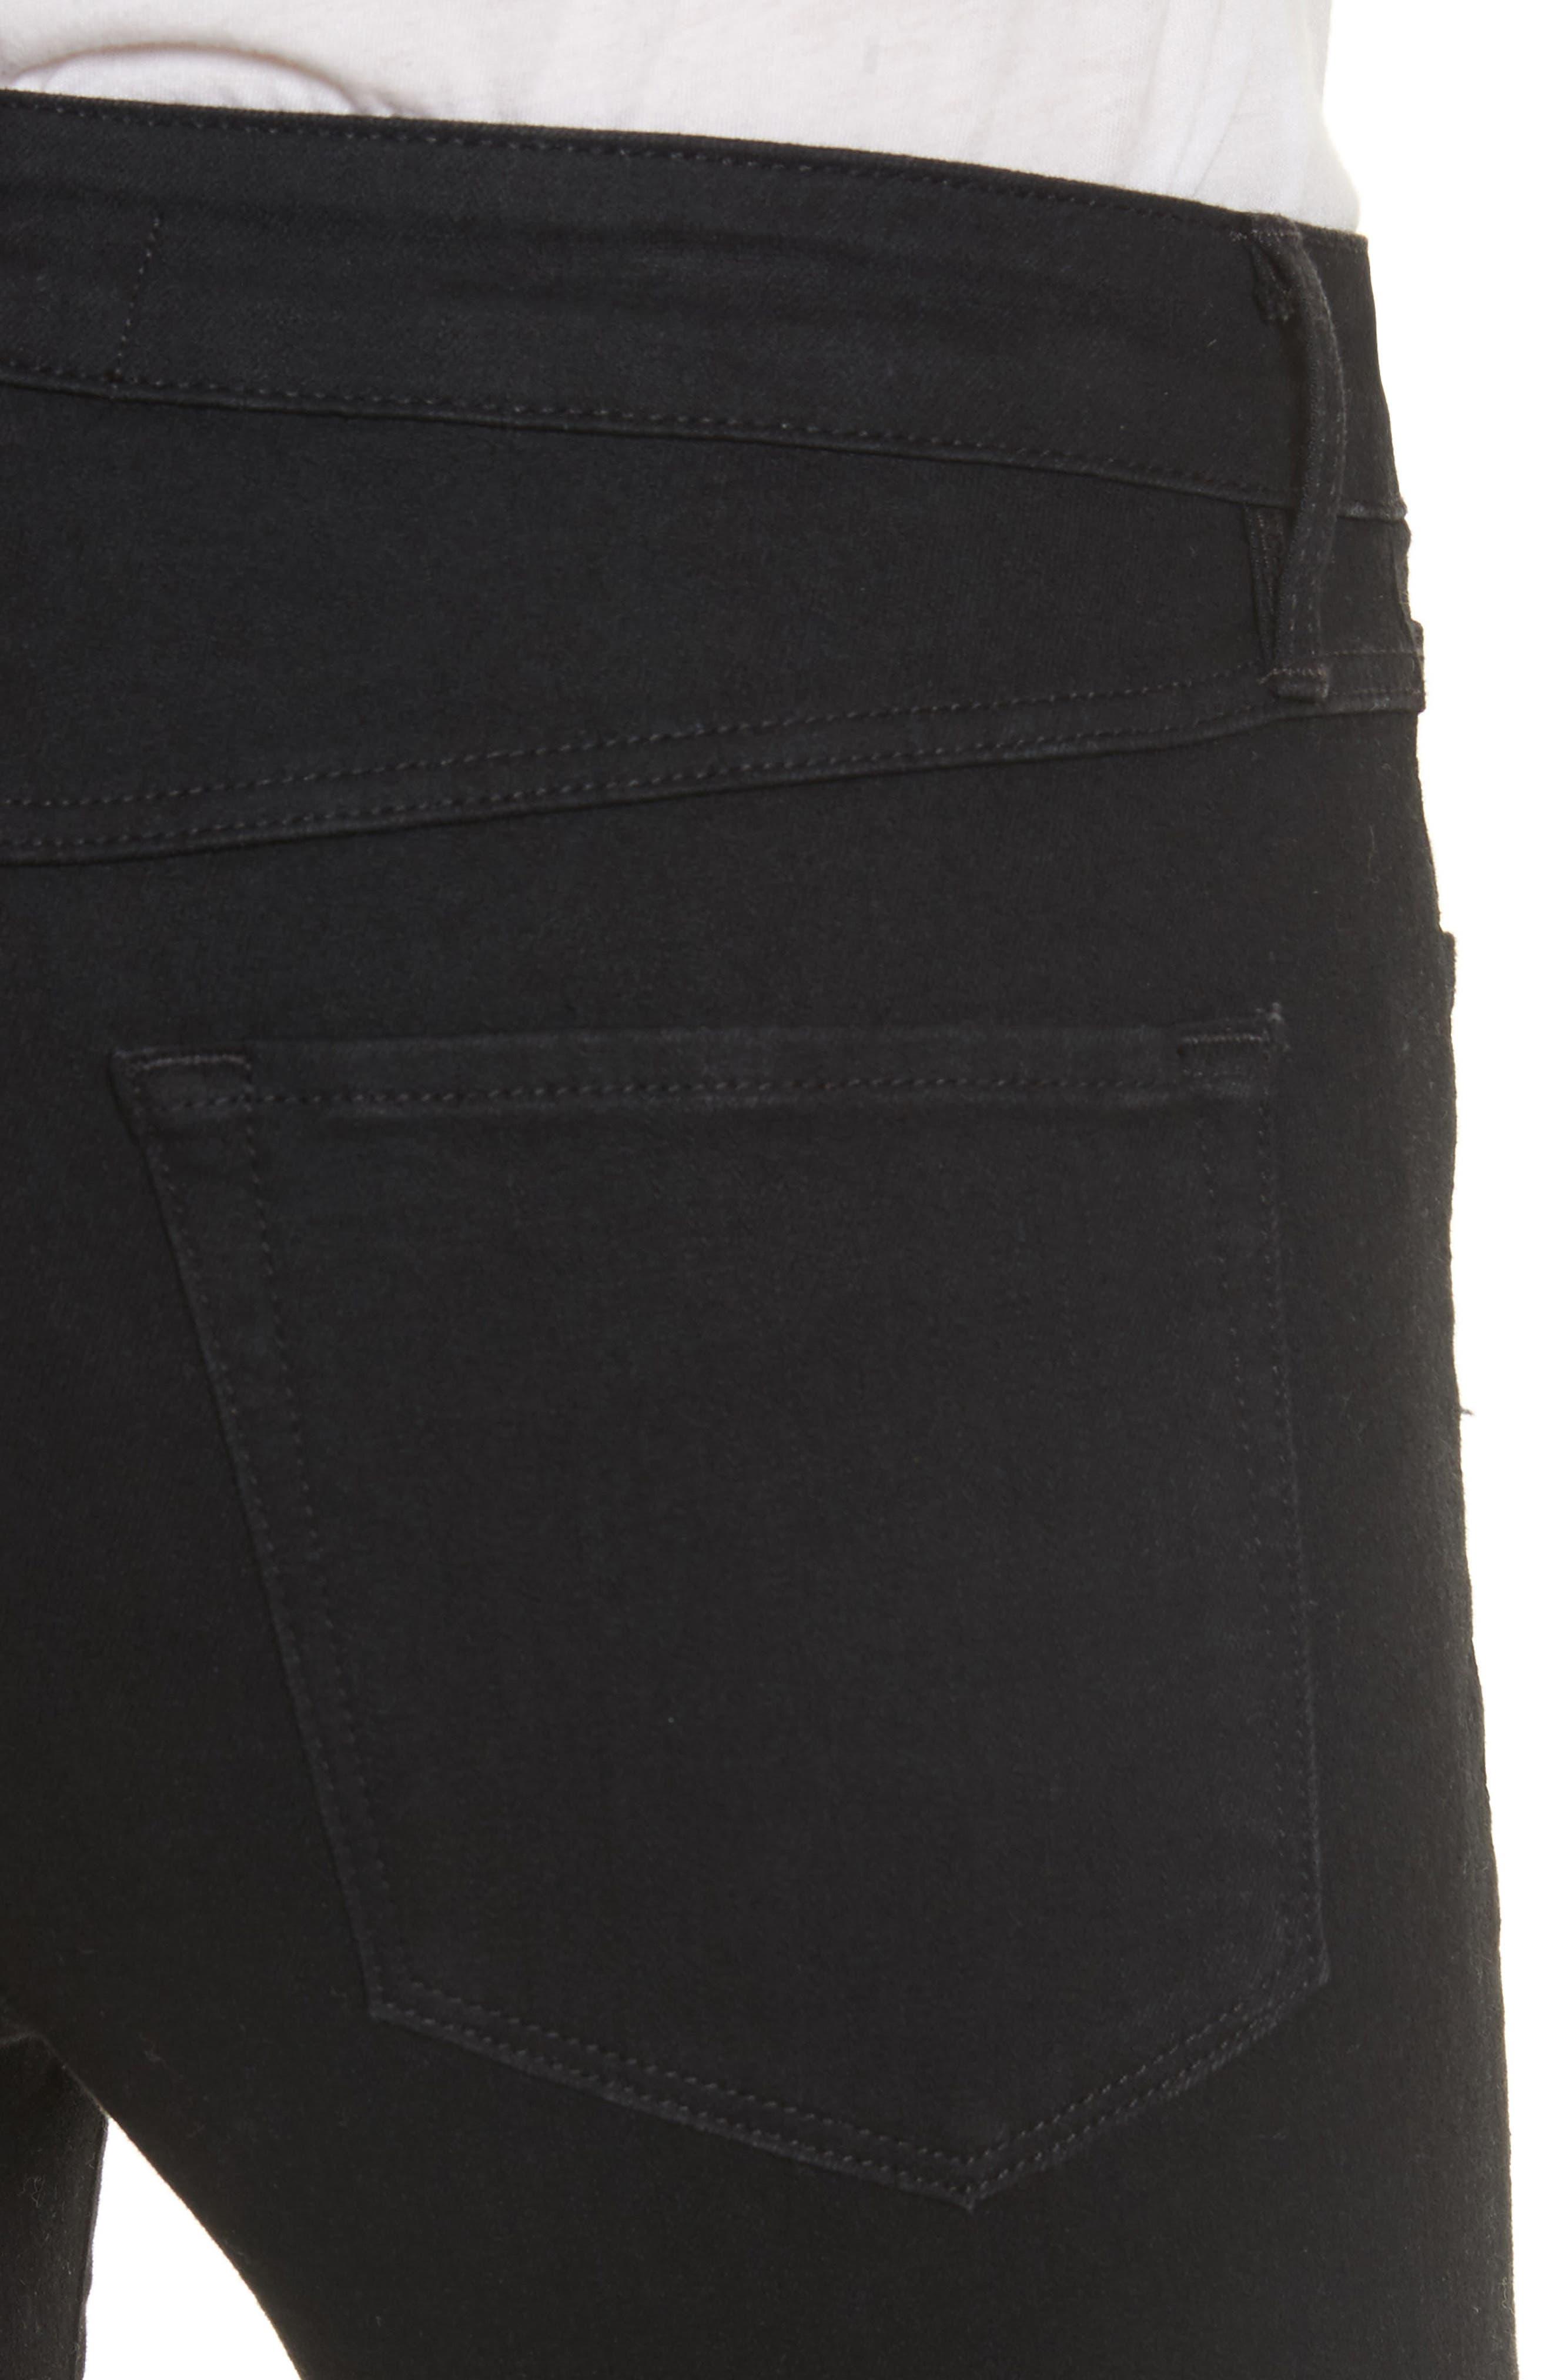 W2 Crop Skinny Jeans,                             Alternate thumbnail 4, color,                             Black Tear